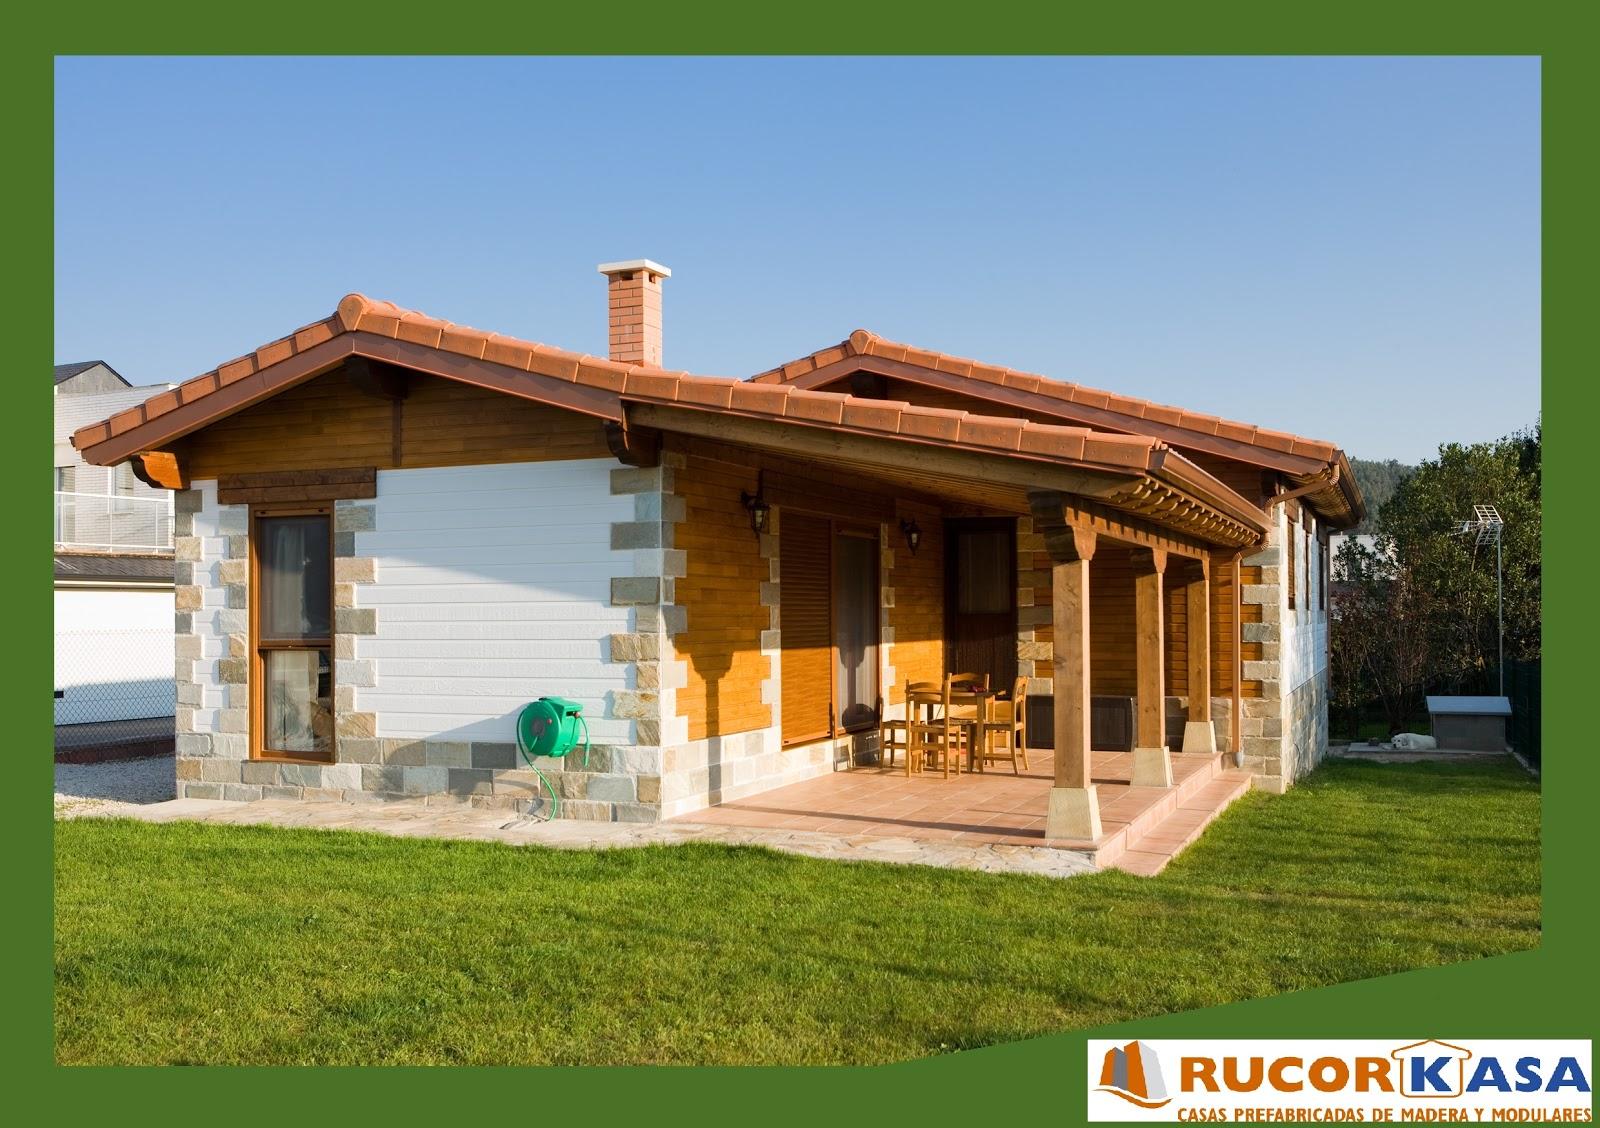 Viviendas prefabricadas rucorkasa hogares de madera - Casas prefabricadas de piedra ...